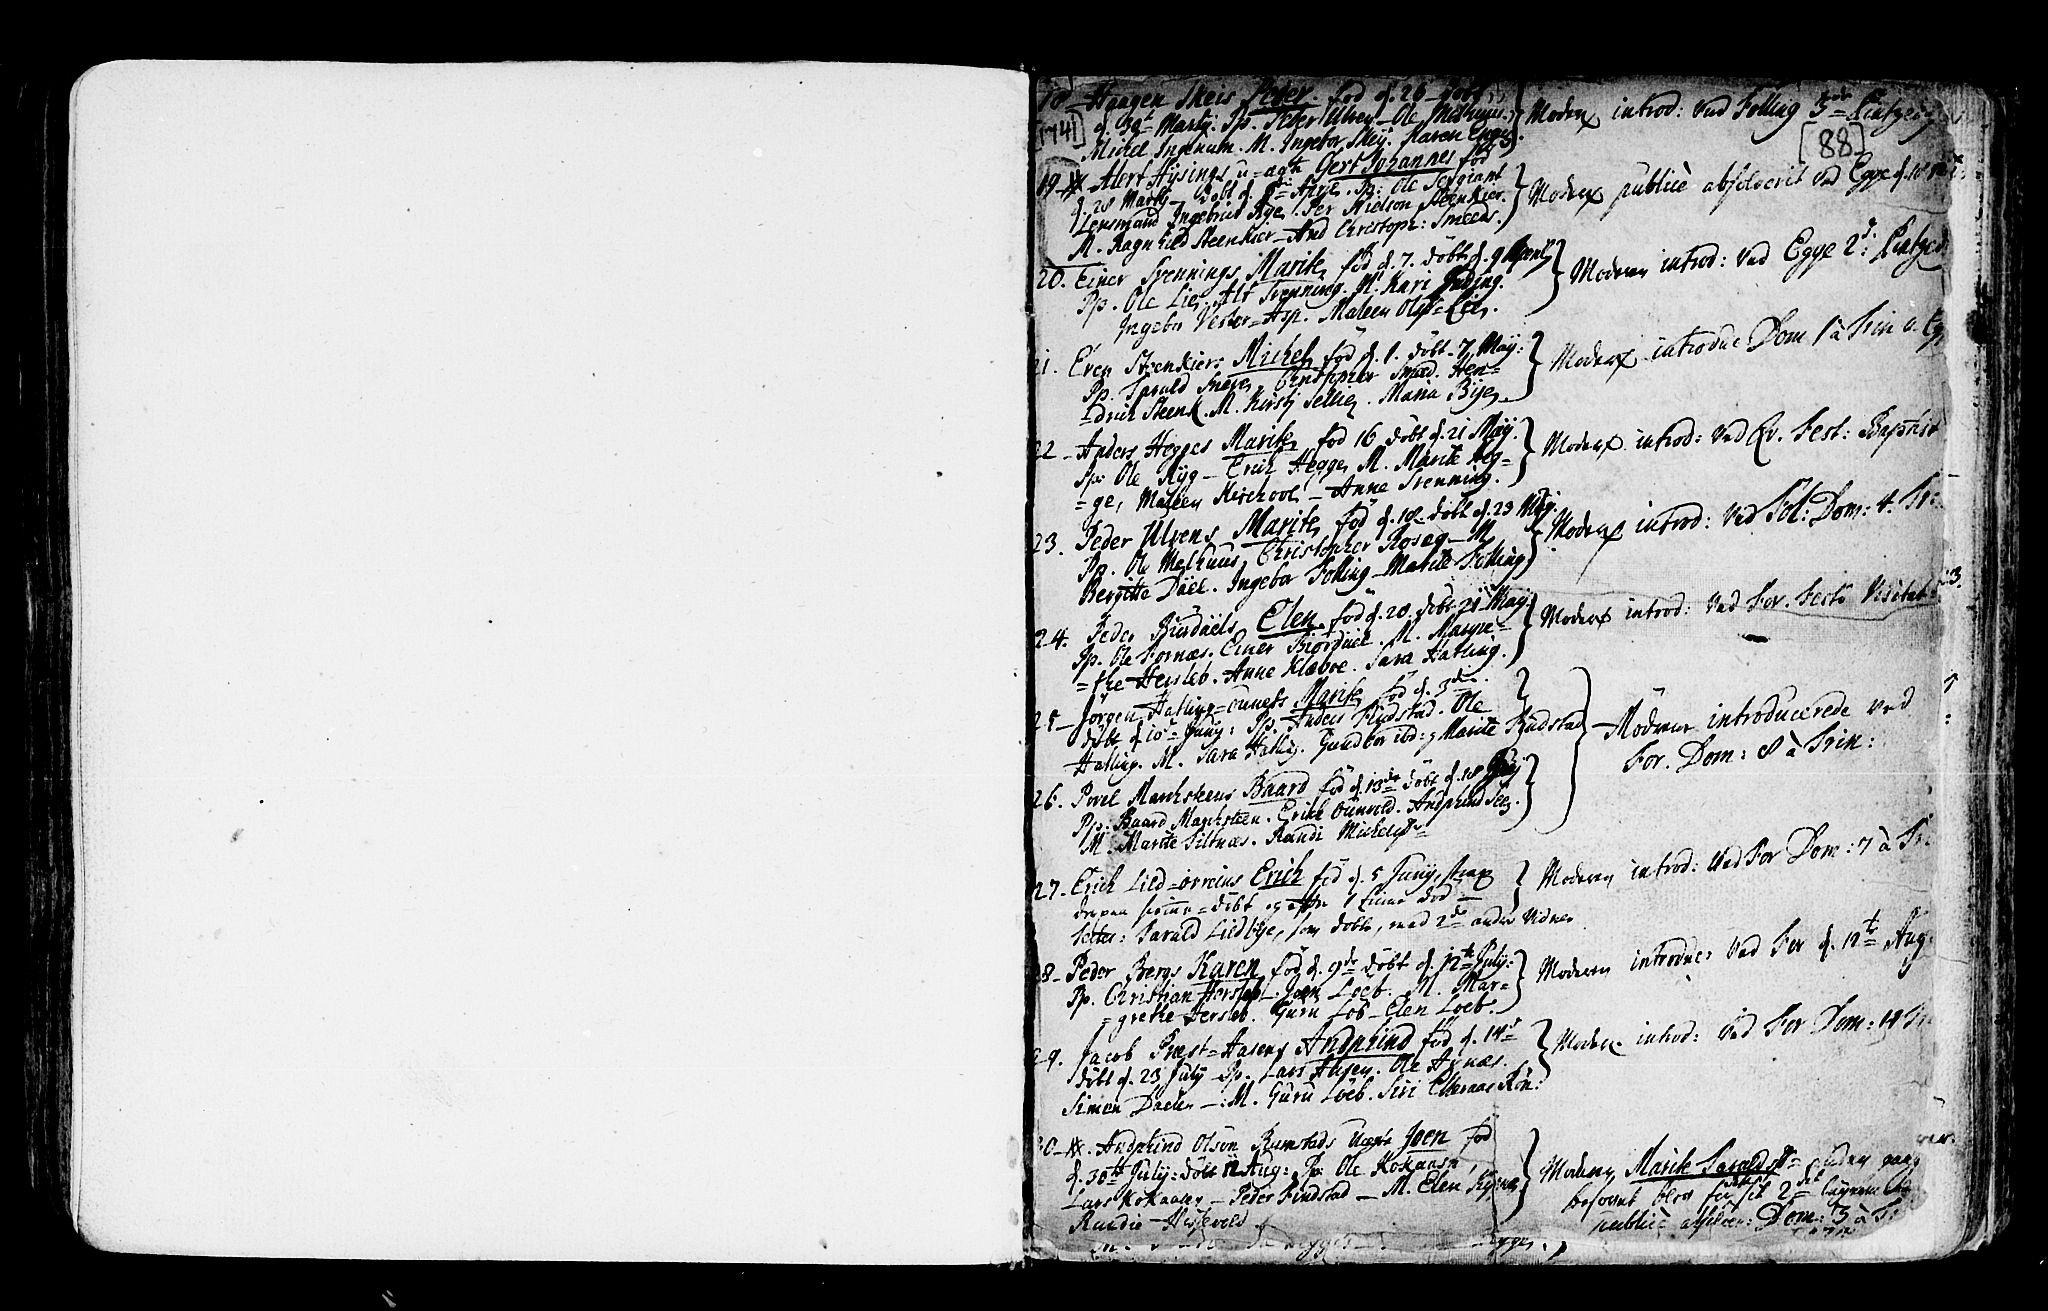 SAT, Ministerialprotokoller, klokkerbøker og fødselsregistre - Nord-Trøndelag, 746/L0439: Ministerialbok nr. 746A01, 1688-1759, s. 88a